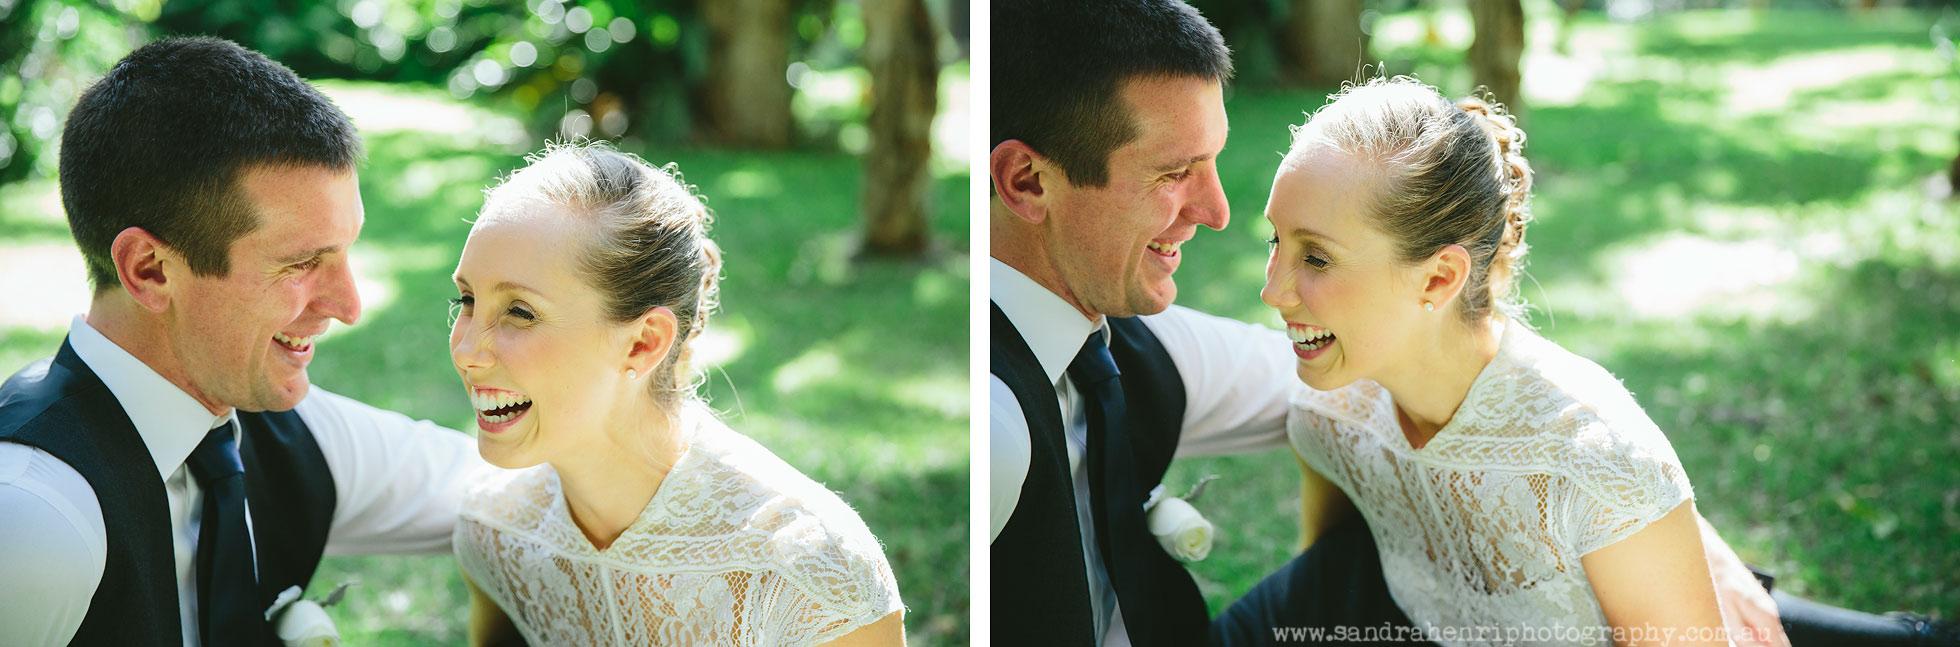 Port-Stephens-Wedding-Photographer-Central-Coast-16.jpg